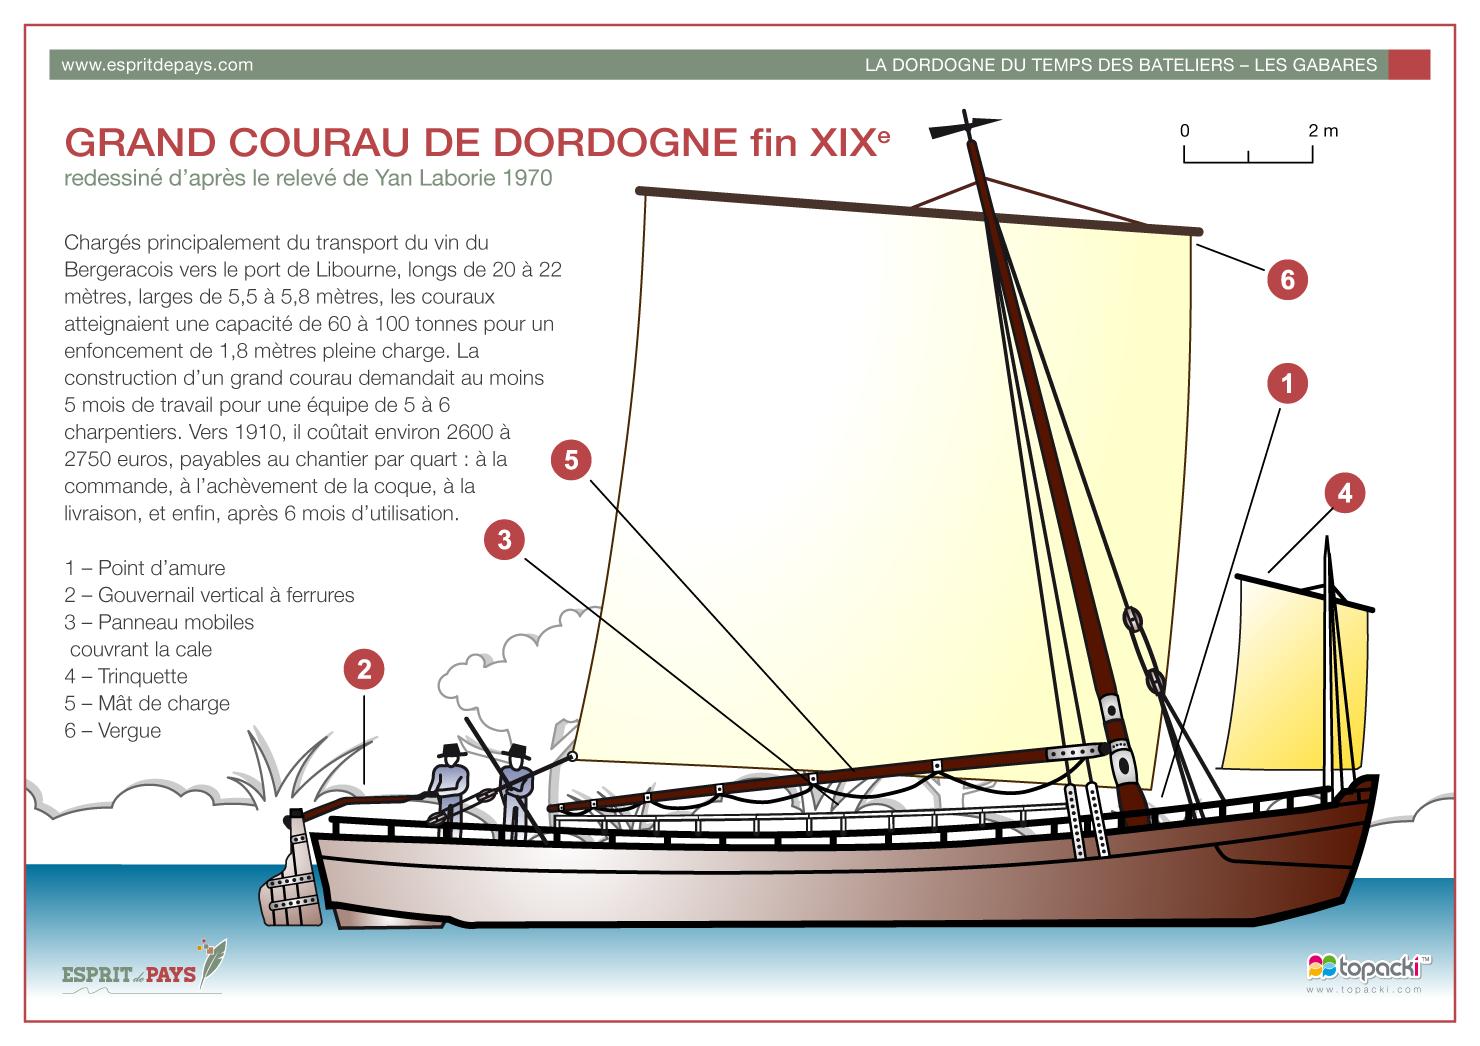 croquis-gabare-grand-courau-dordogne-fin-XIXe-s